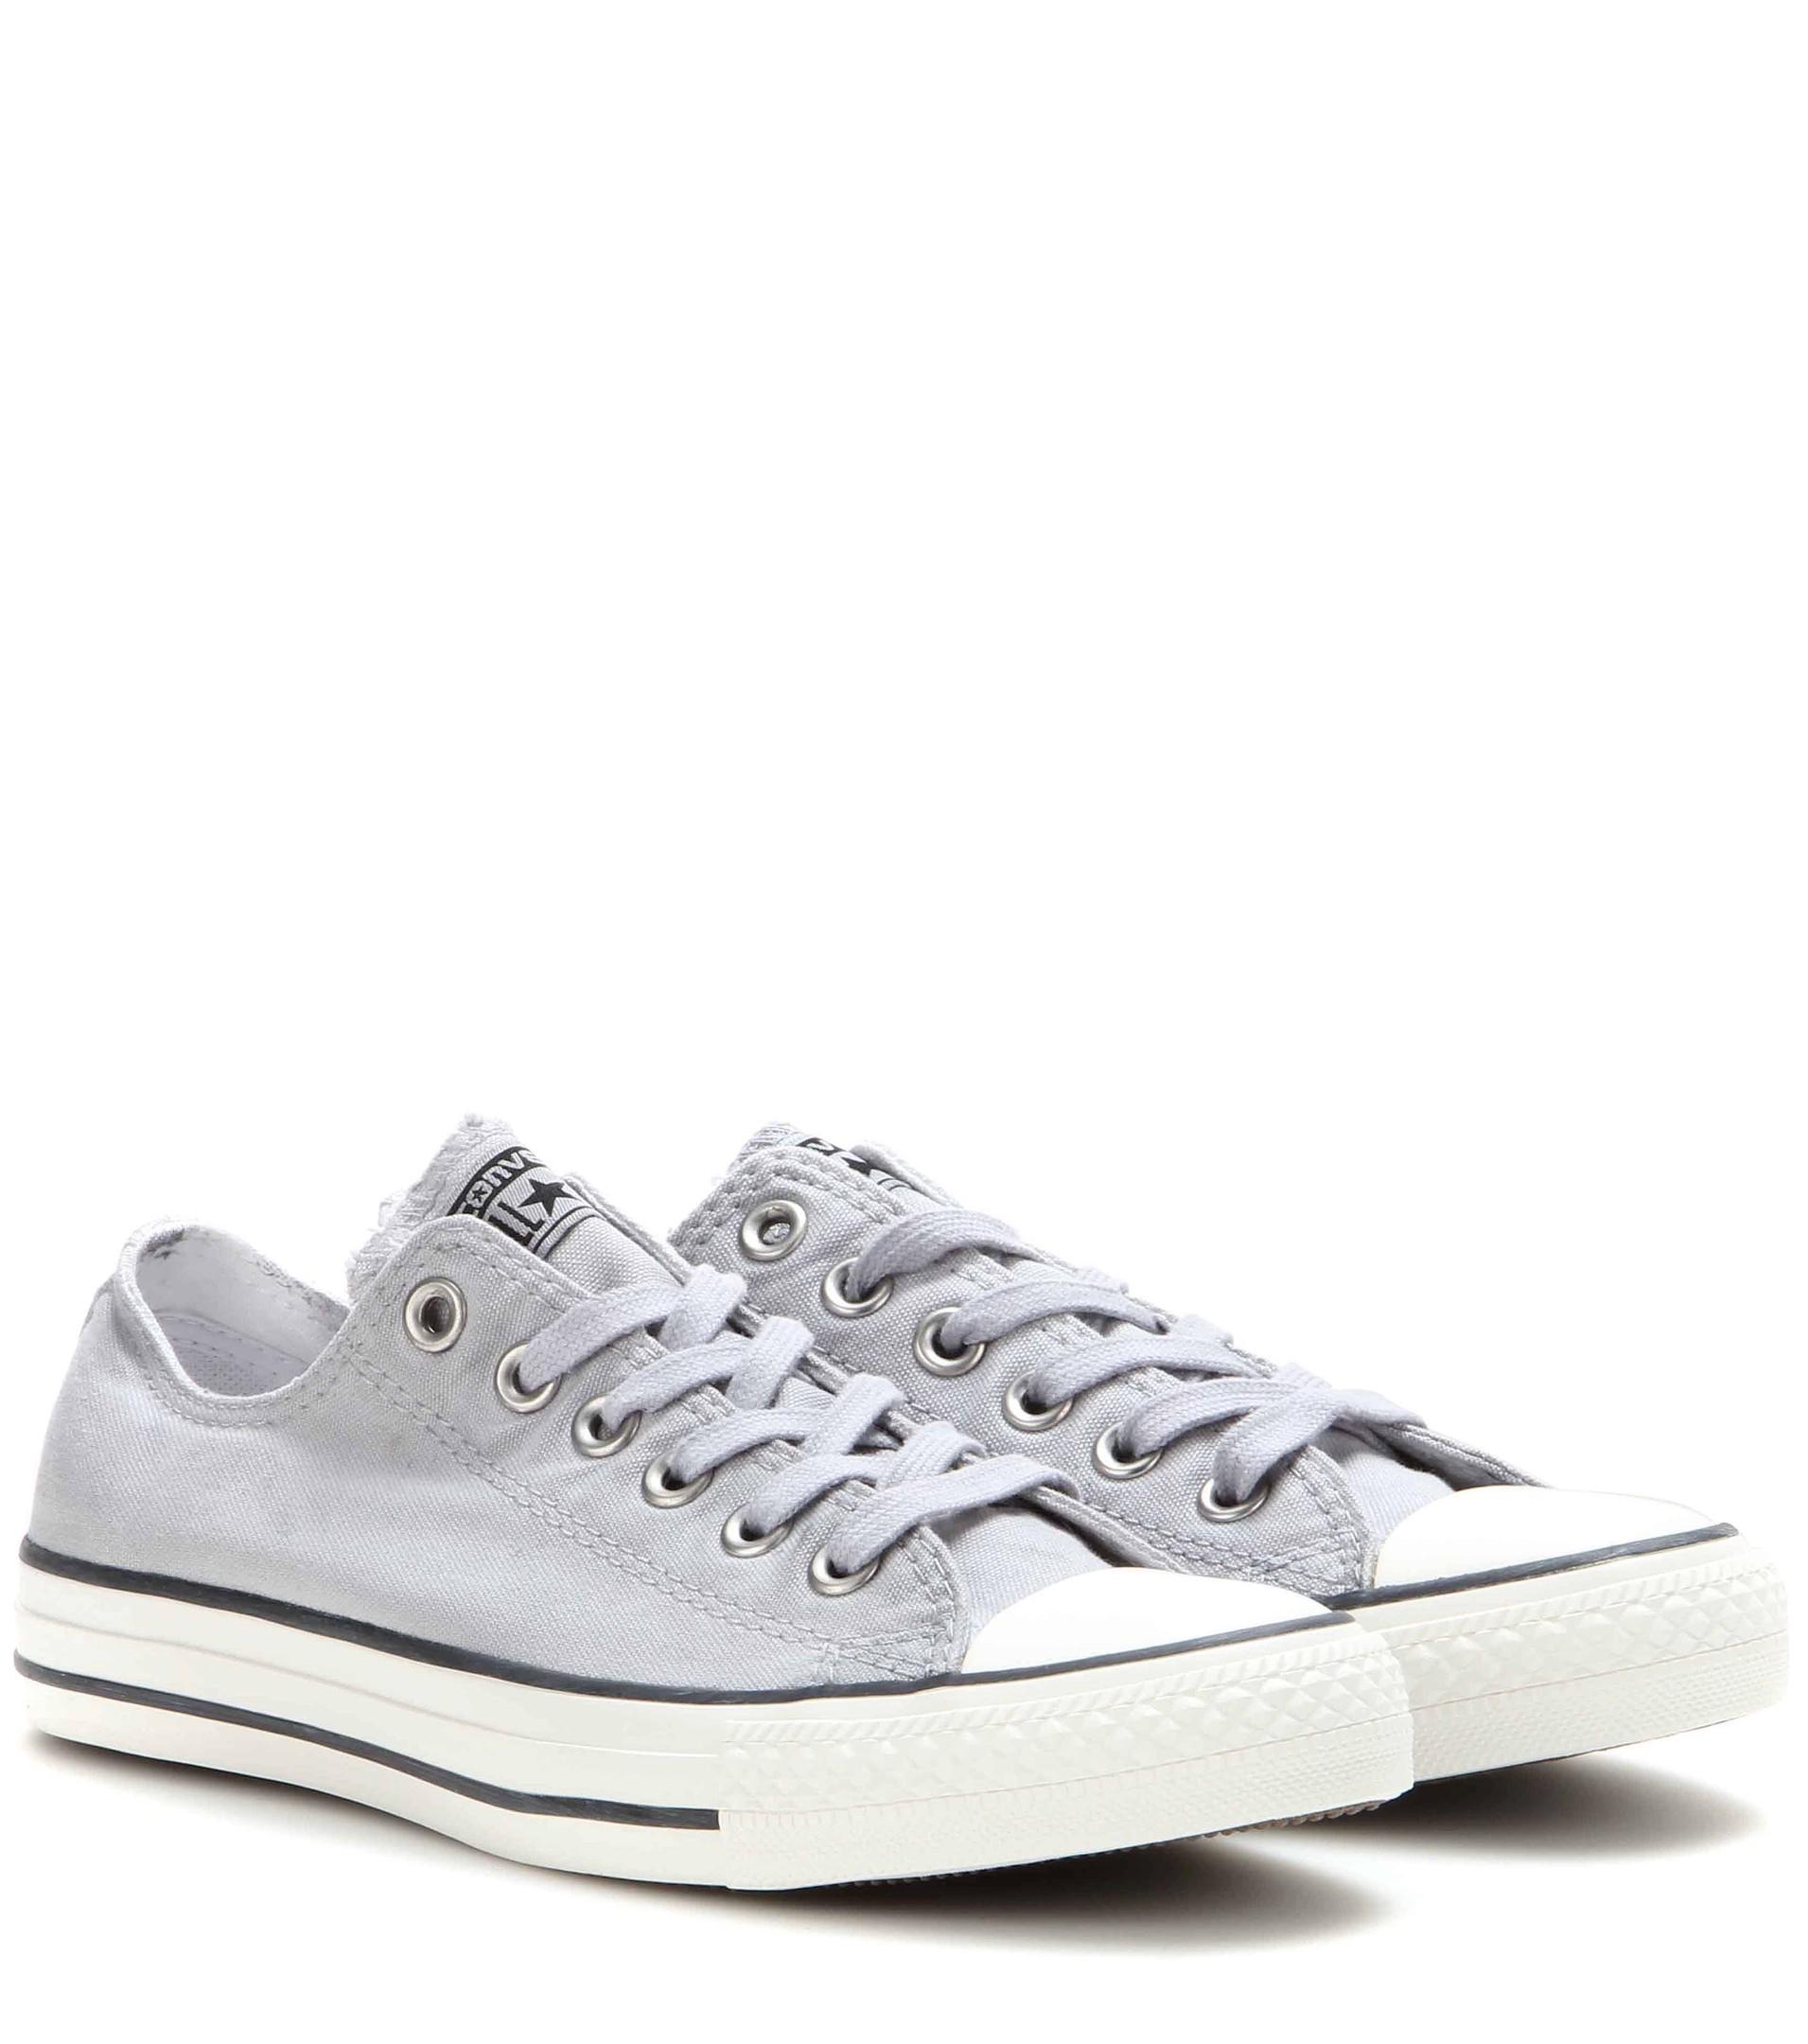 Fashional Lady - Converse All Star Low Chuck Taylors Grey-Blue Canvas Sale